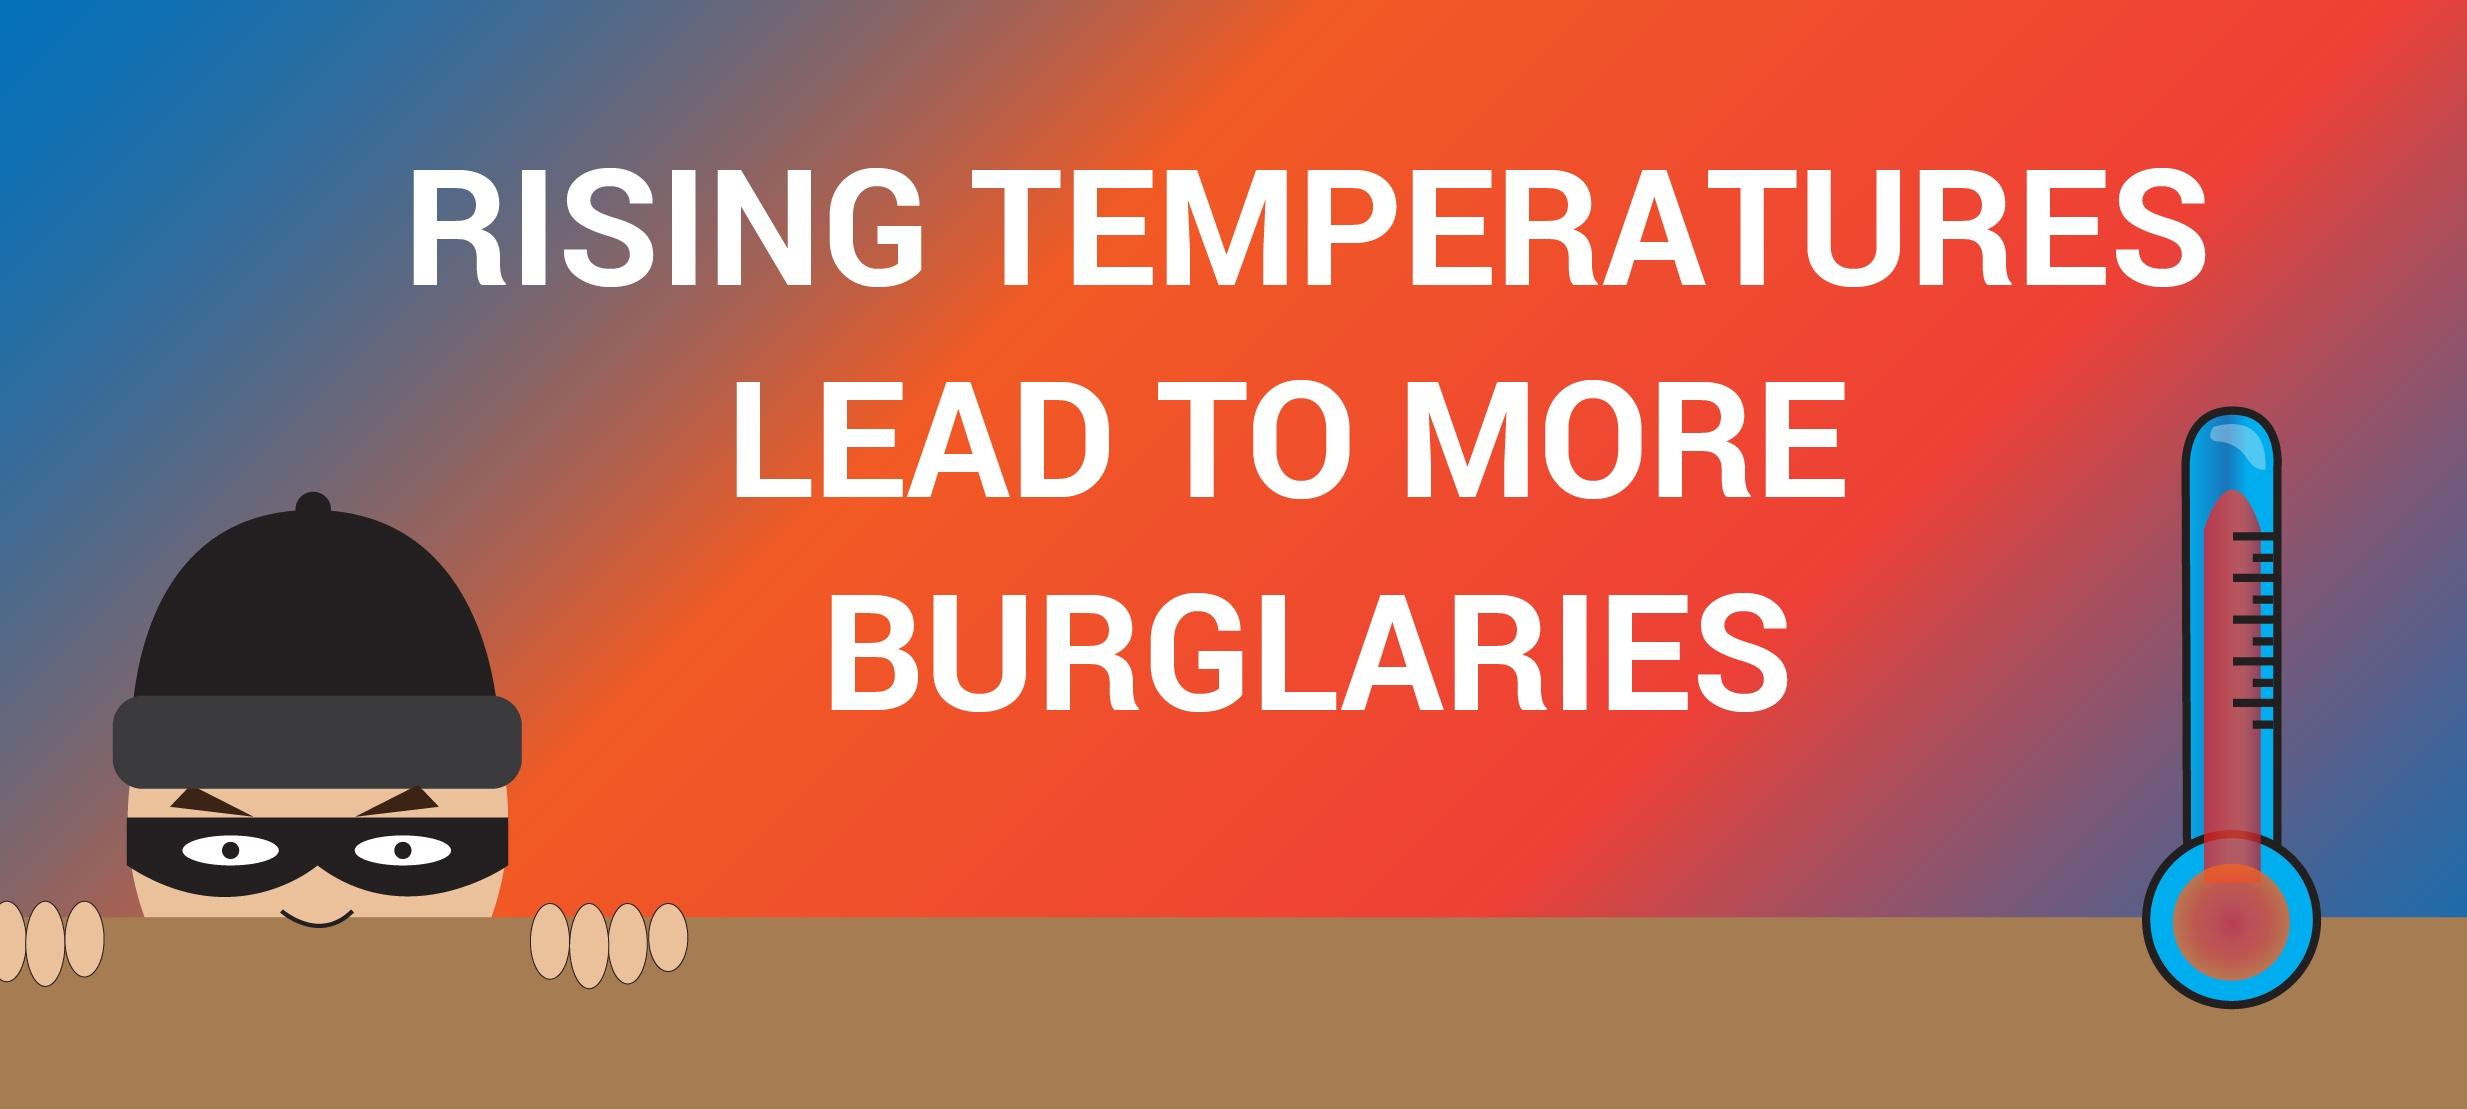 Warm weather leads to more burglaries